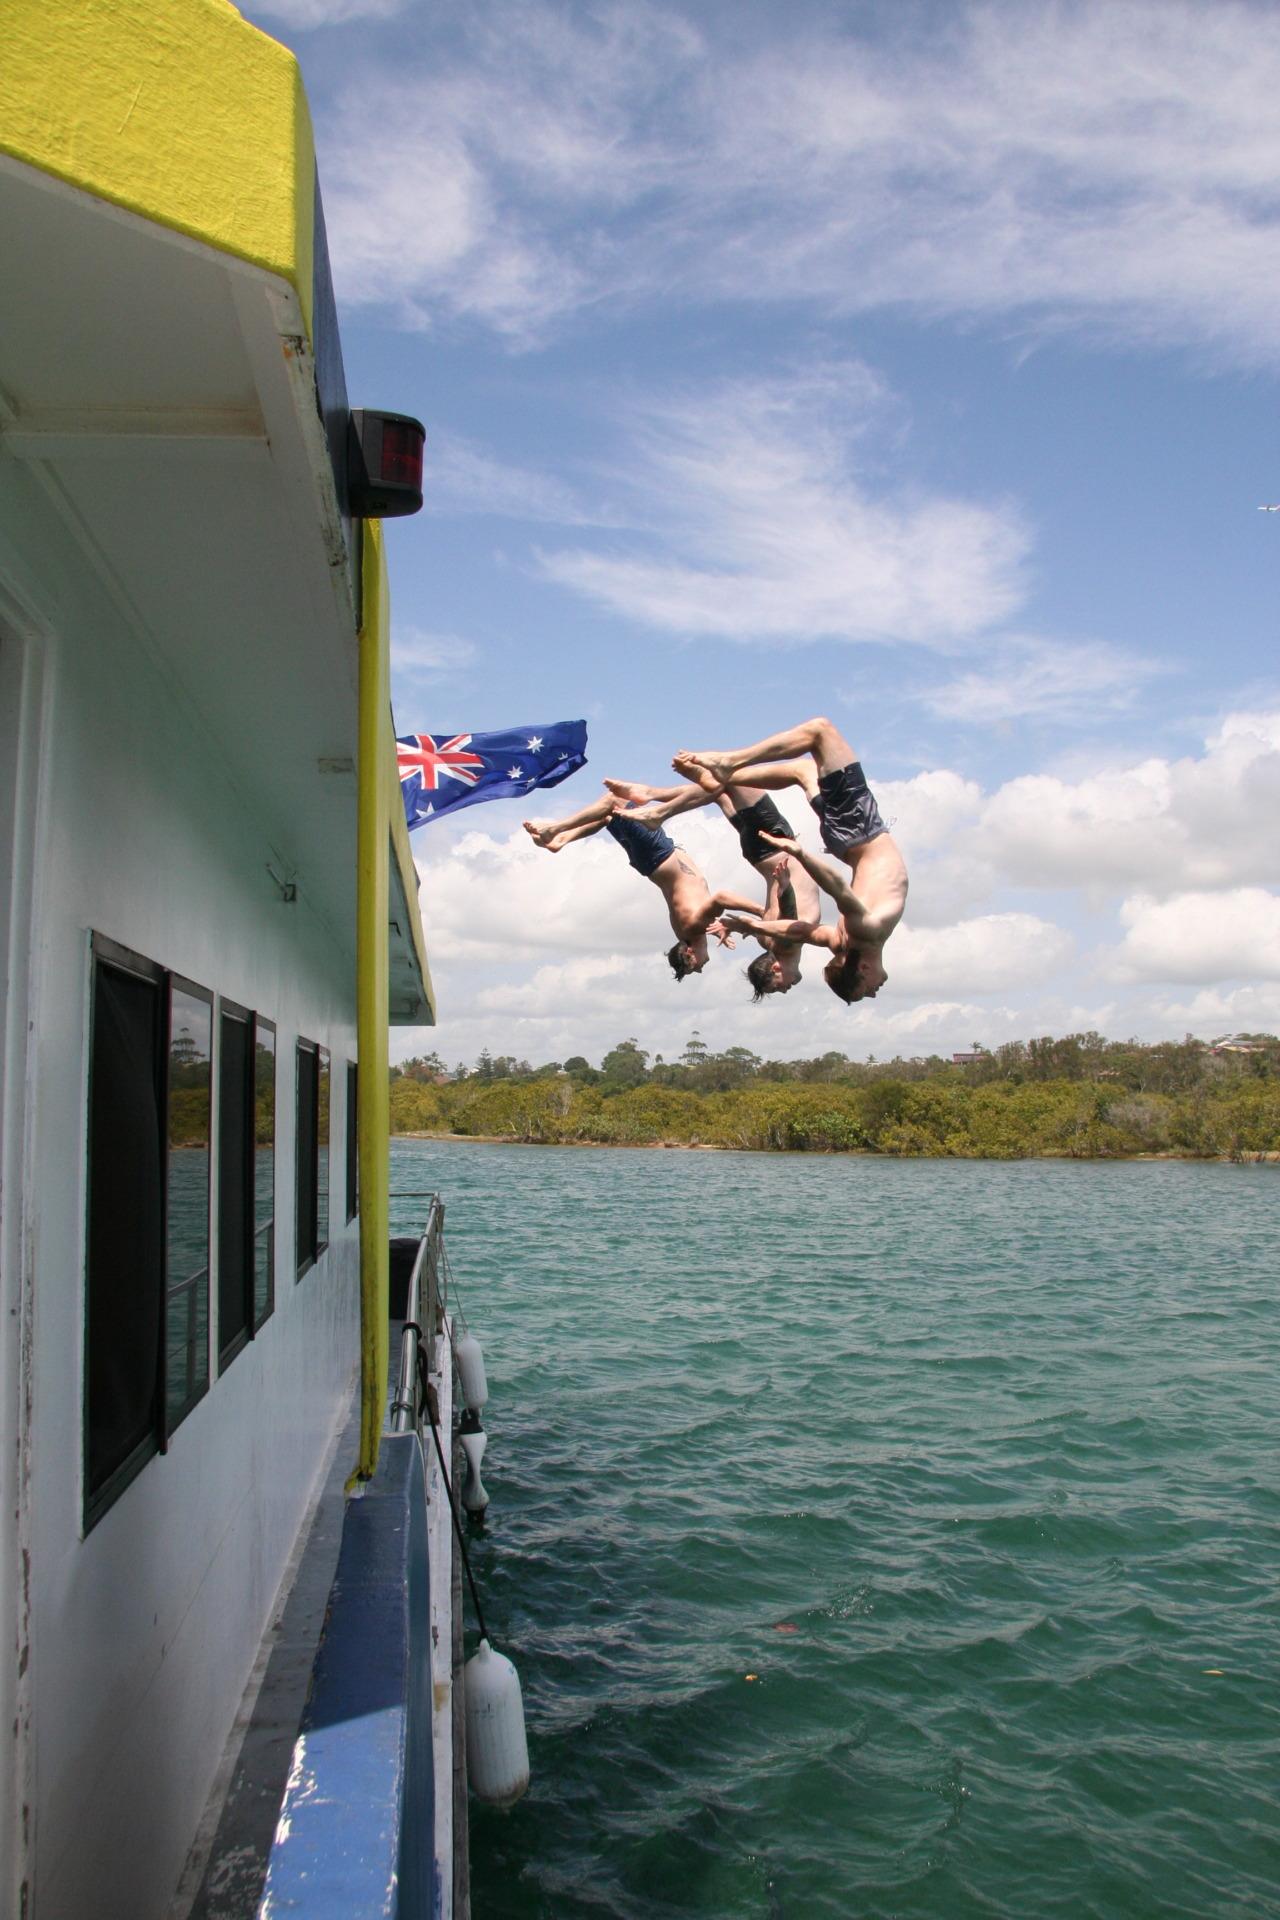 3 boys diving backwards off a boat